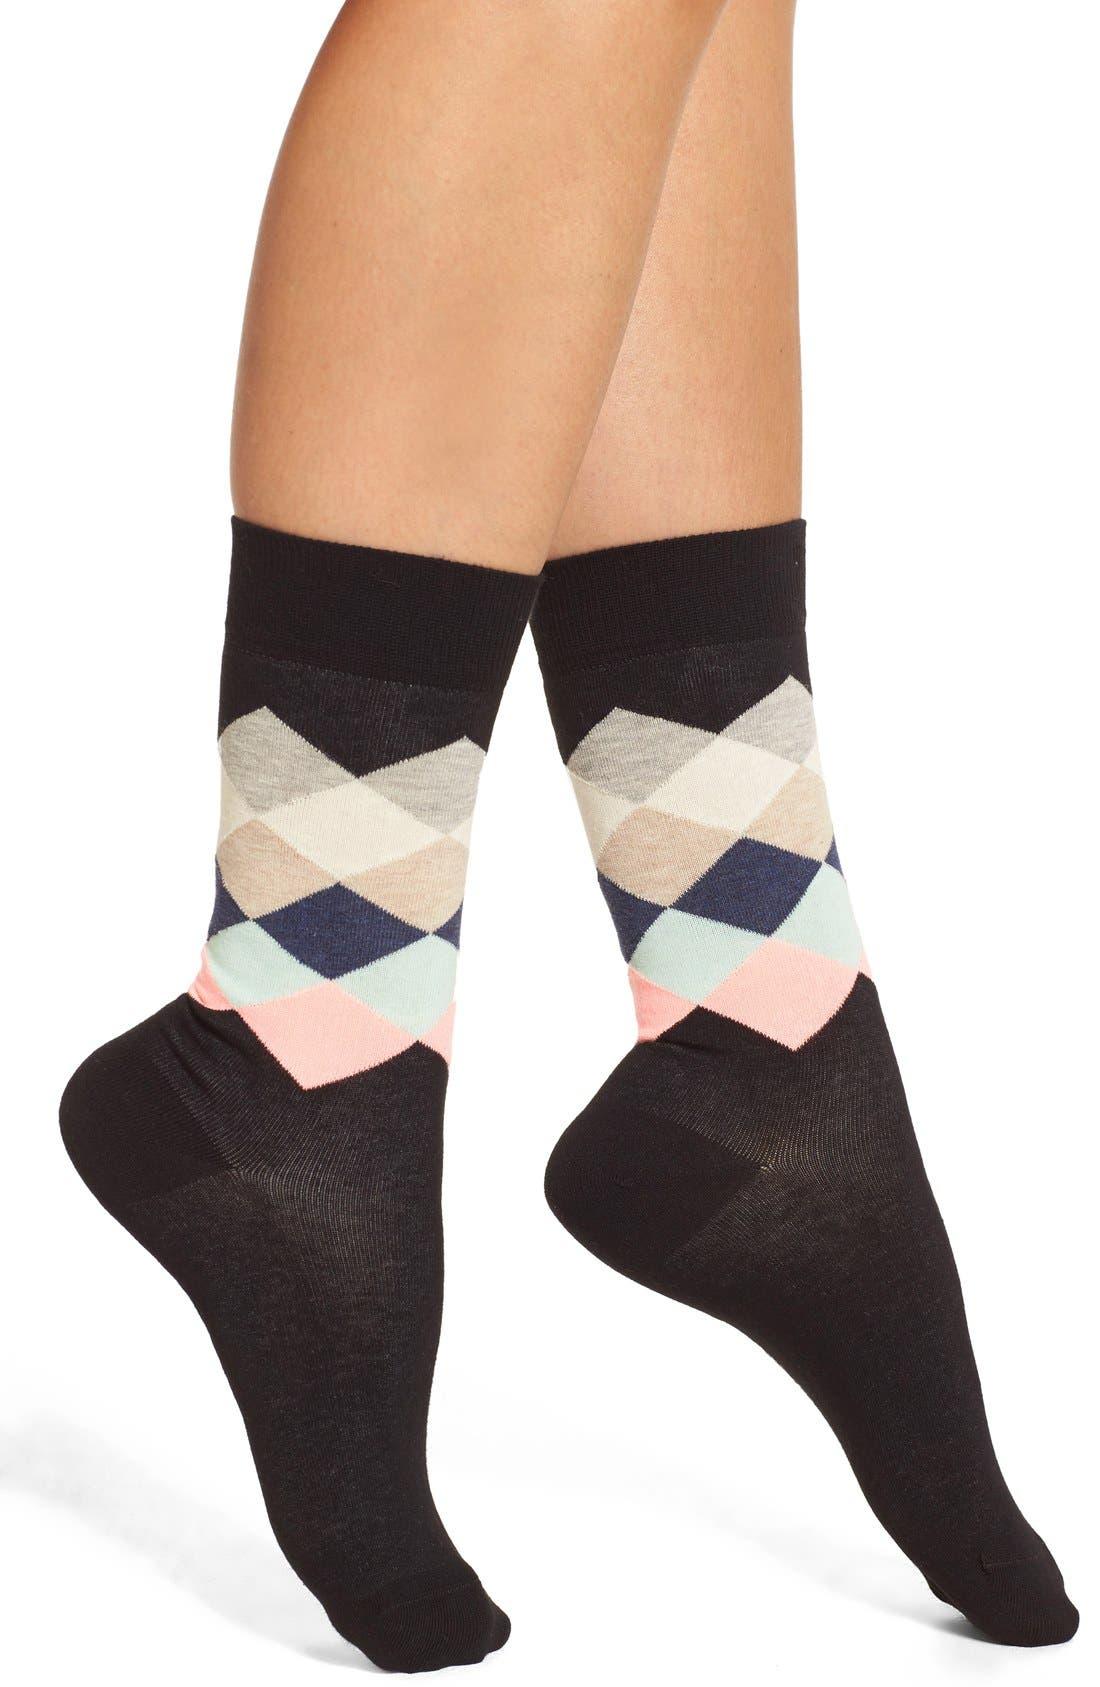 Happy Socks 'Faded Diamond' Crew Socks